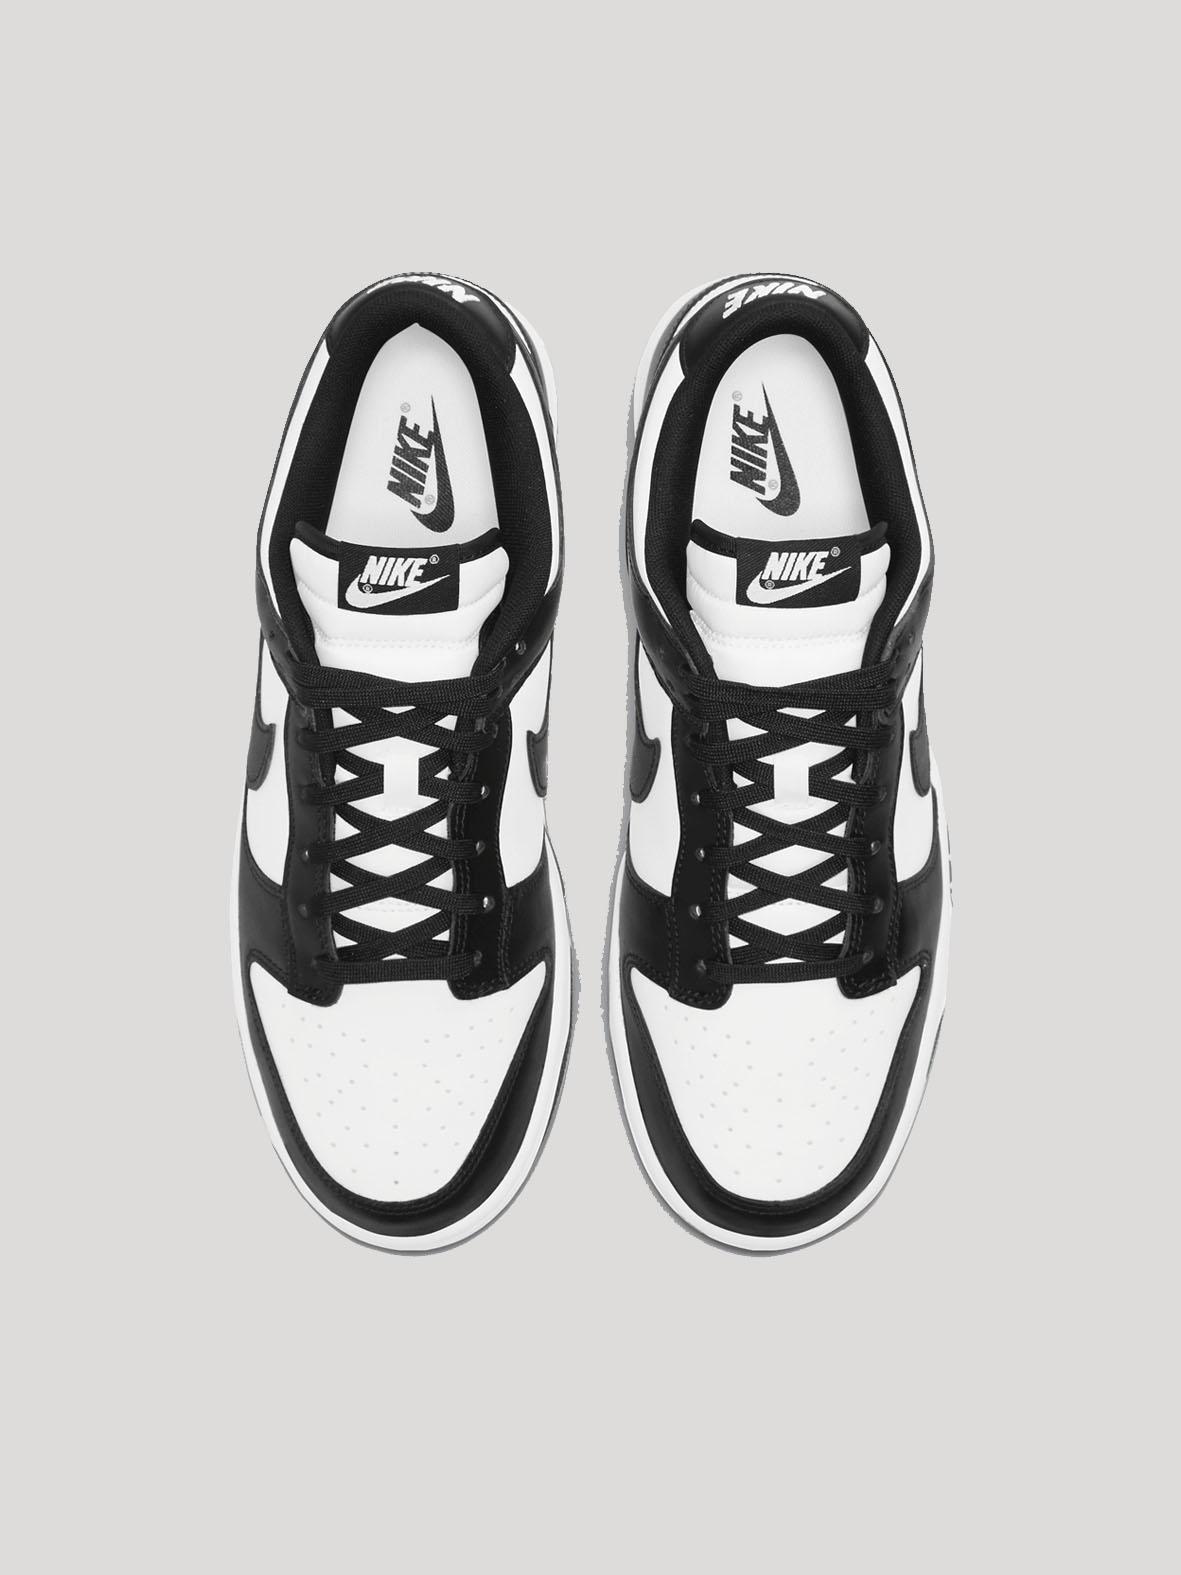 Nike Dunk Low Retro WMS Sneakers - Kicks Galeria